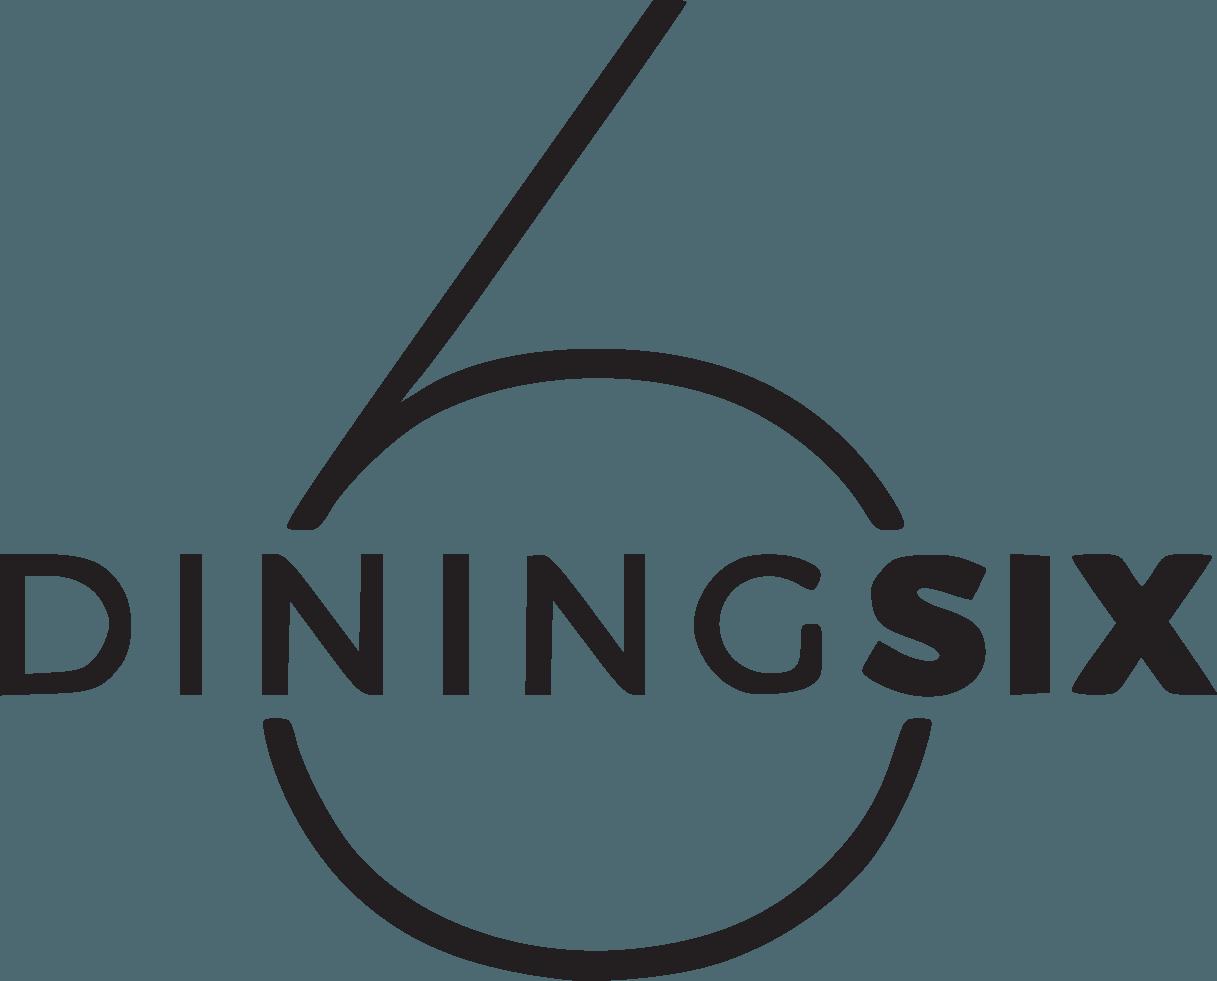 DiningSix